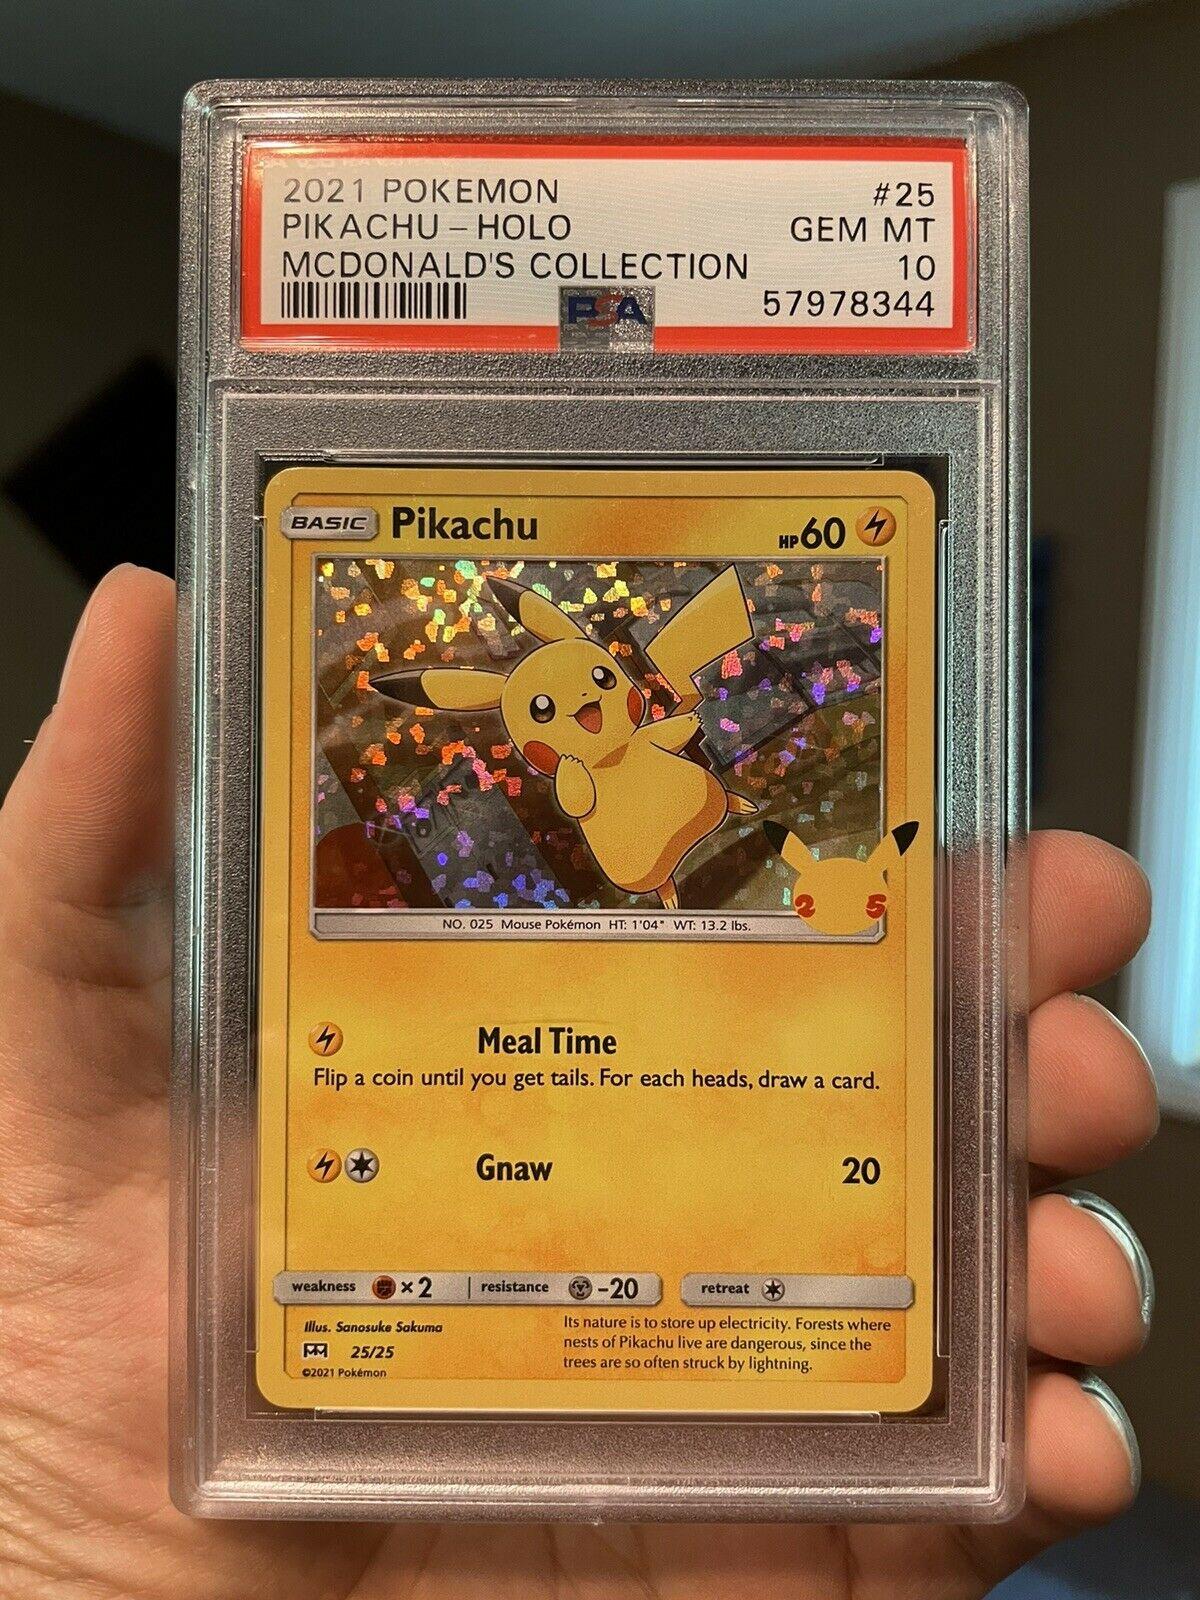 2021 Pokemon McDonald's Collection Promo Pikachu Holo PSA 10 Gem Mint - 25/25